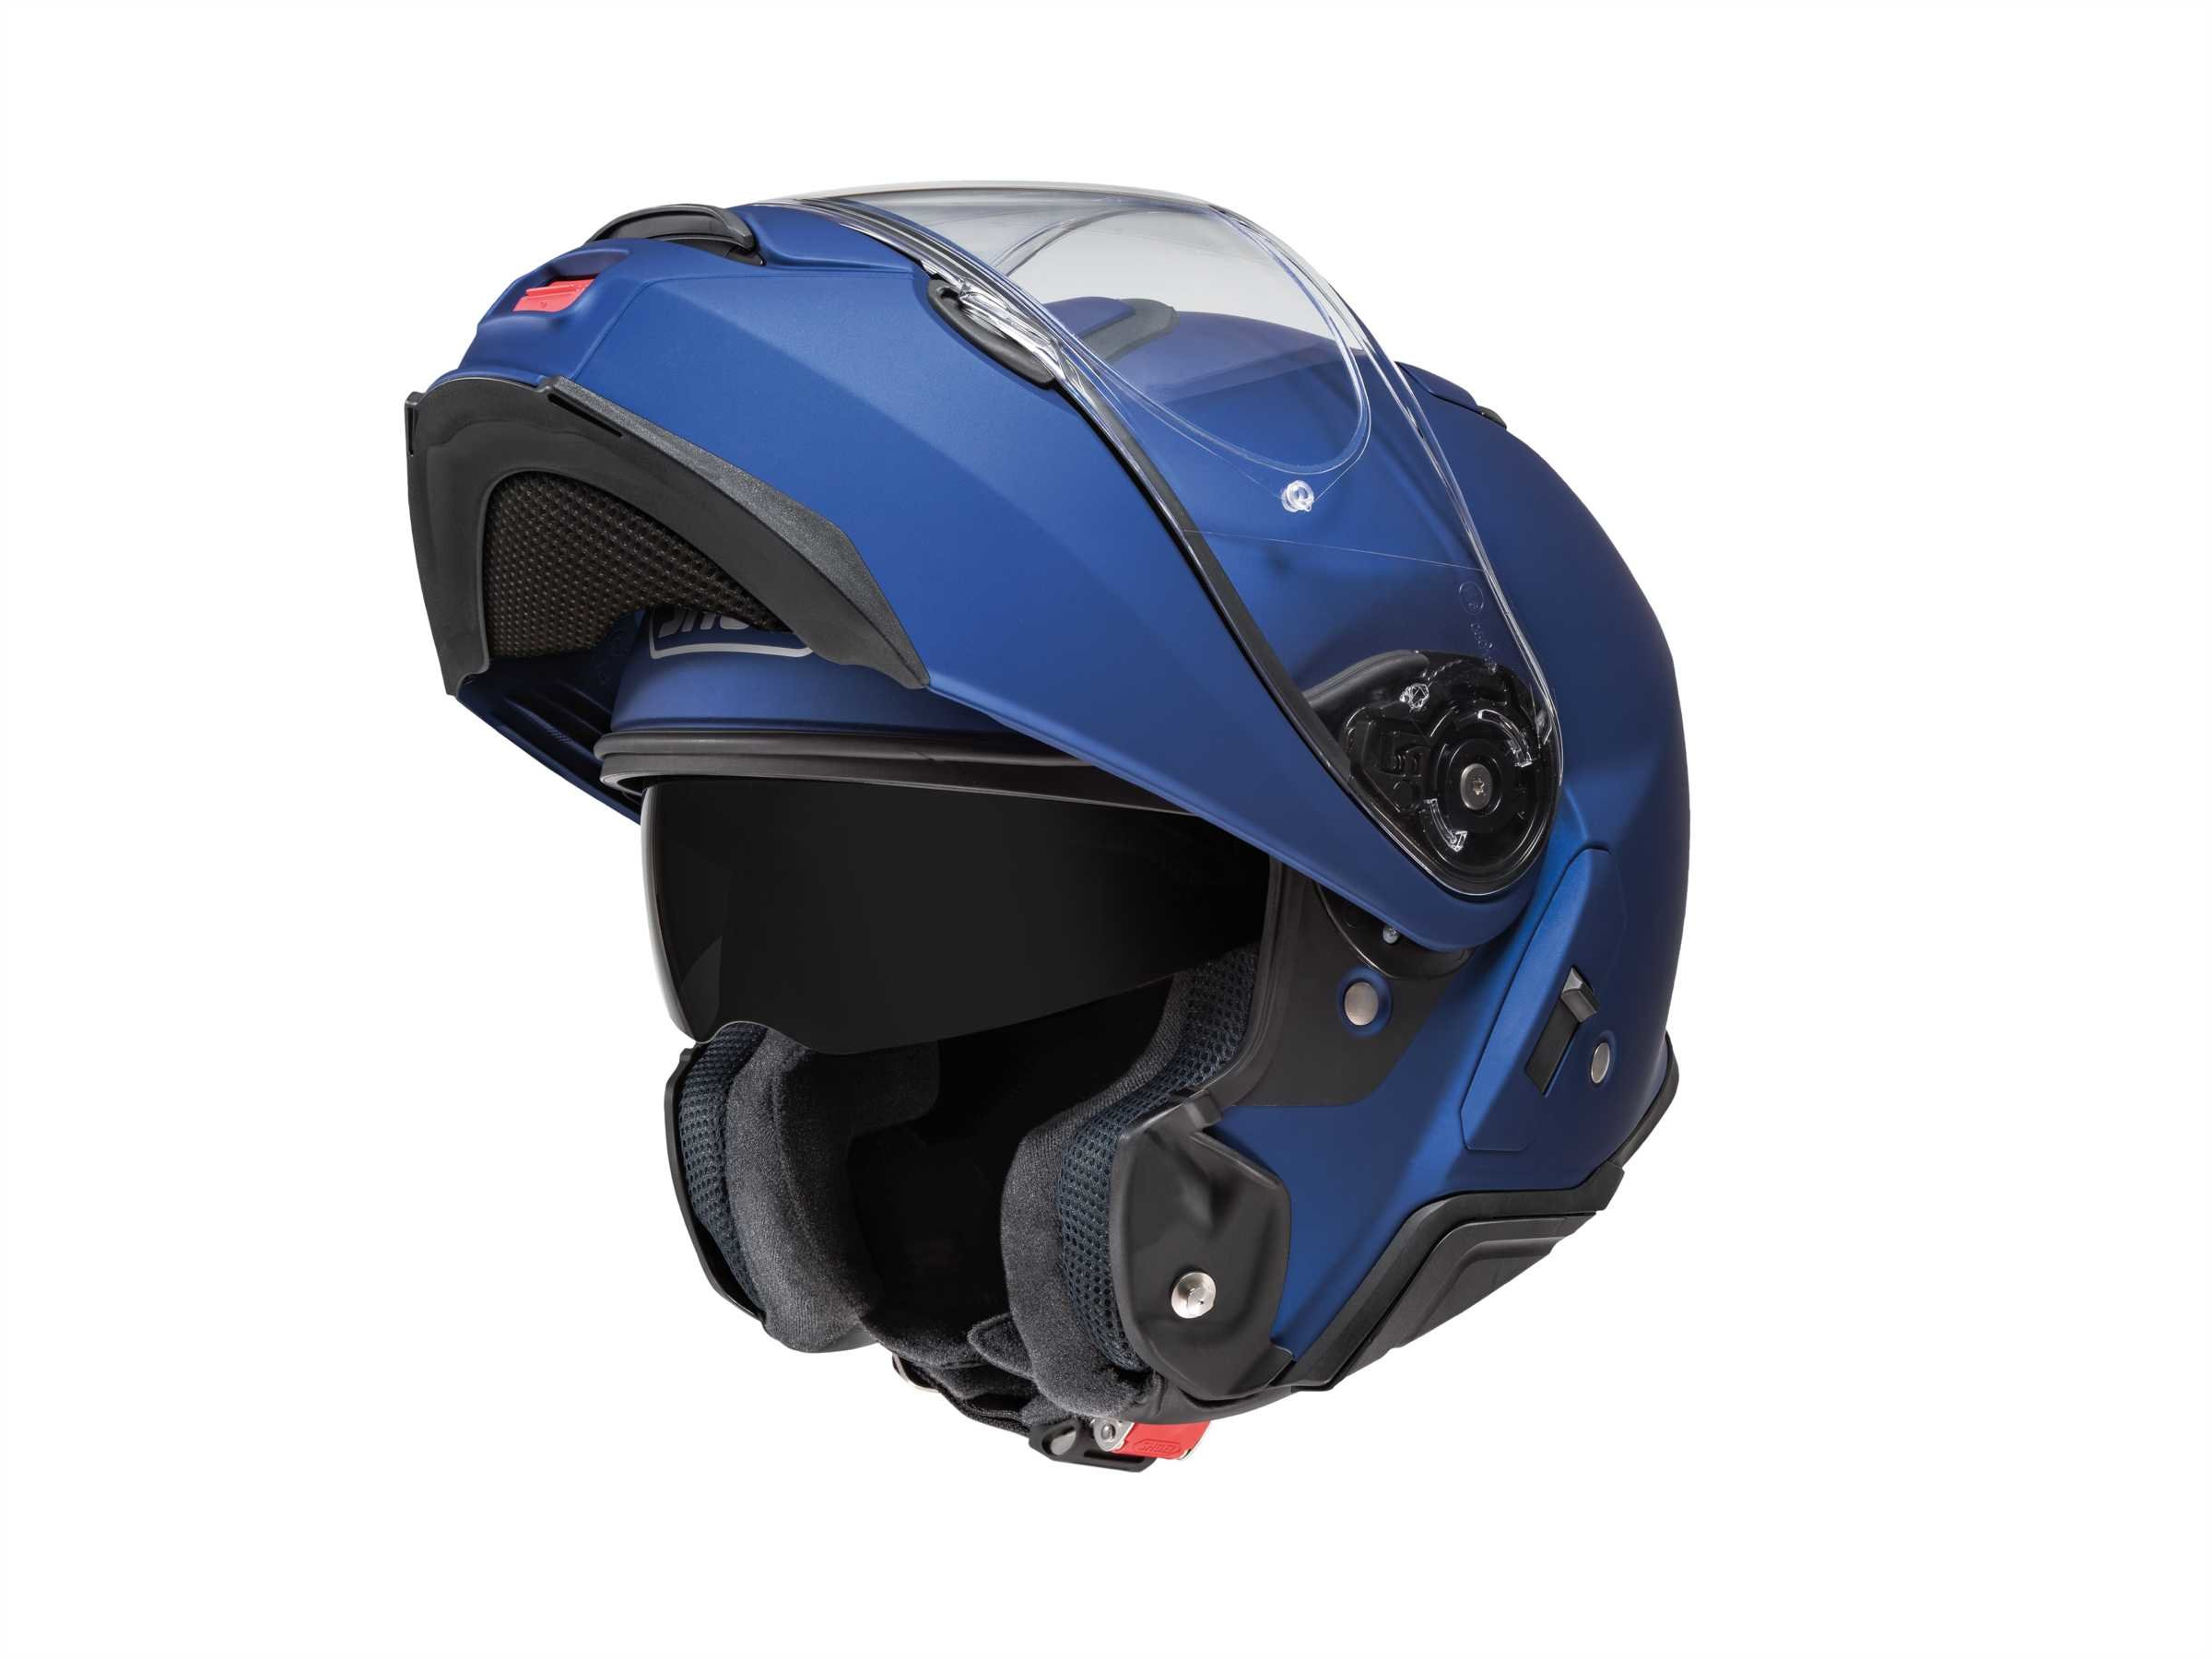 f70efbd6 Helmet Preview: The New Shoei Neotec II | webBikeWorld